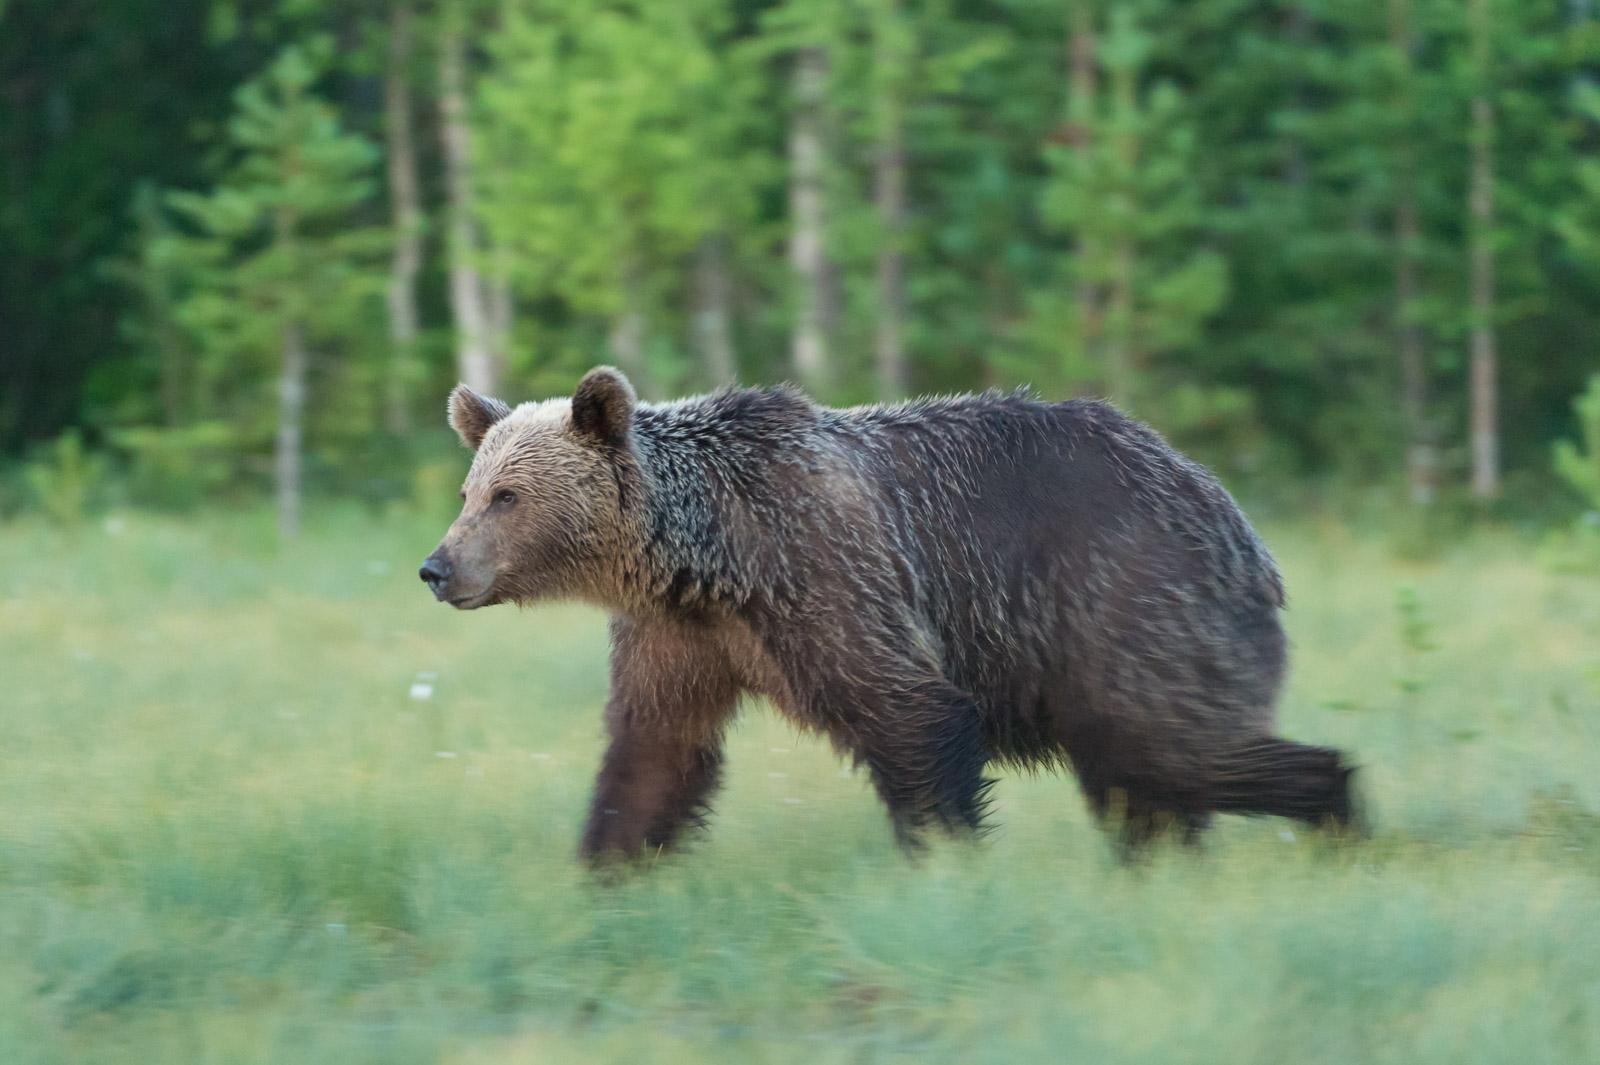 panning wildlife blur